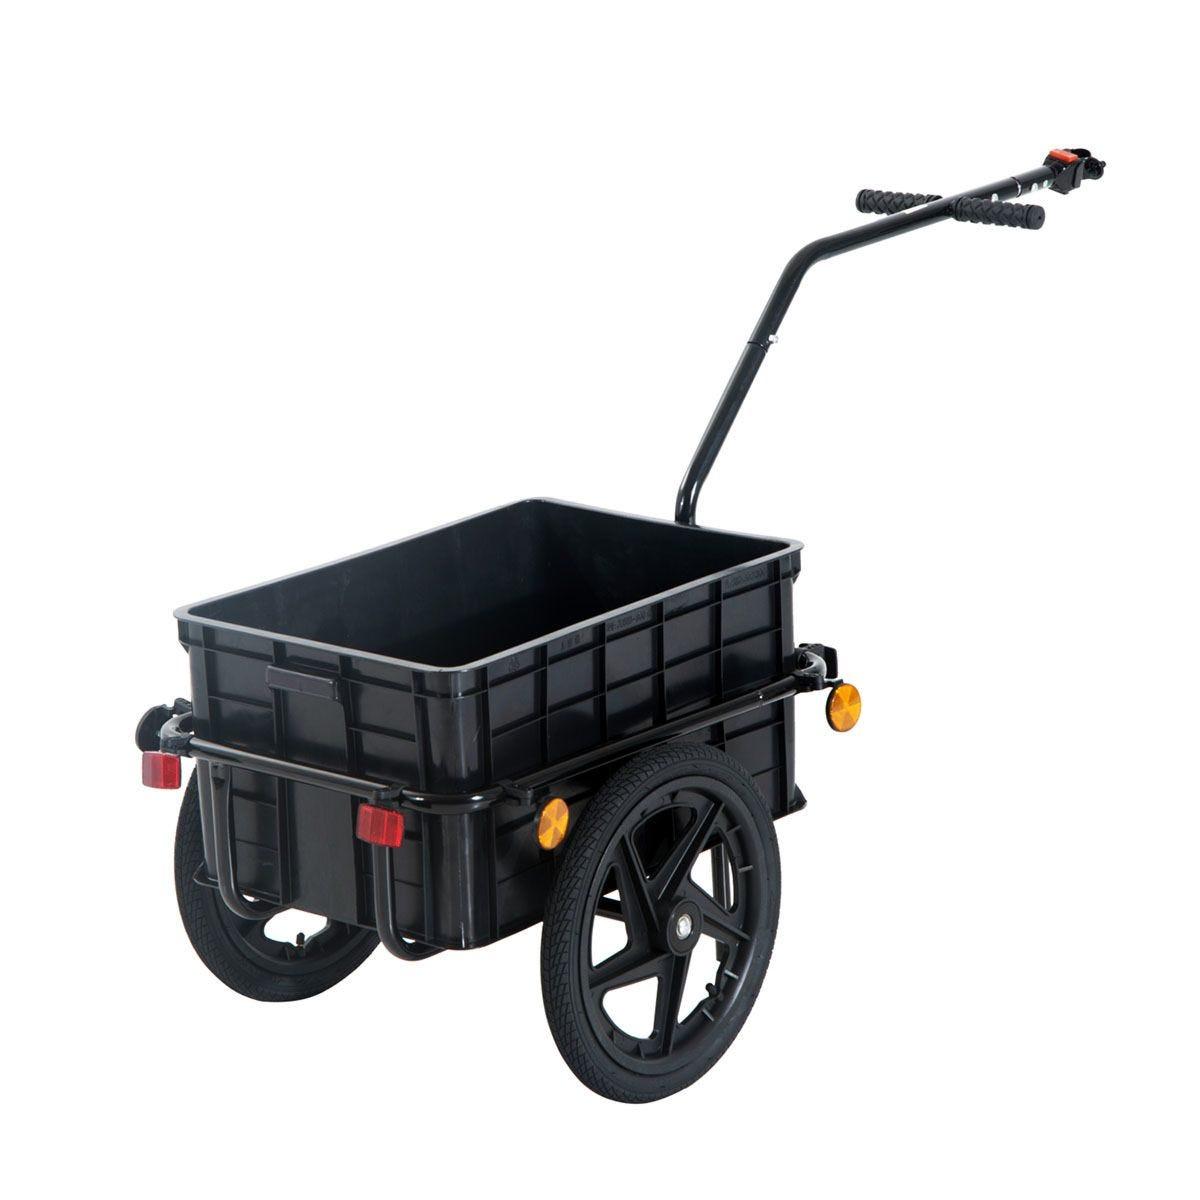 HOMCOM Cargo Trailer Bike with Carrier Utility Luggage - Black